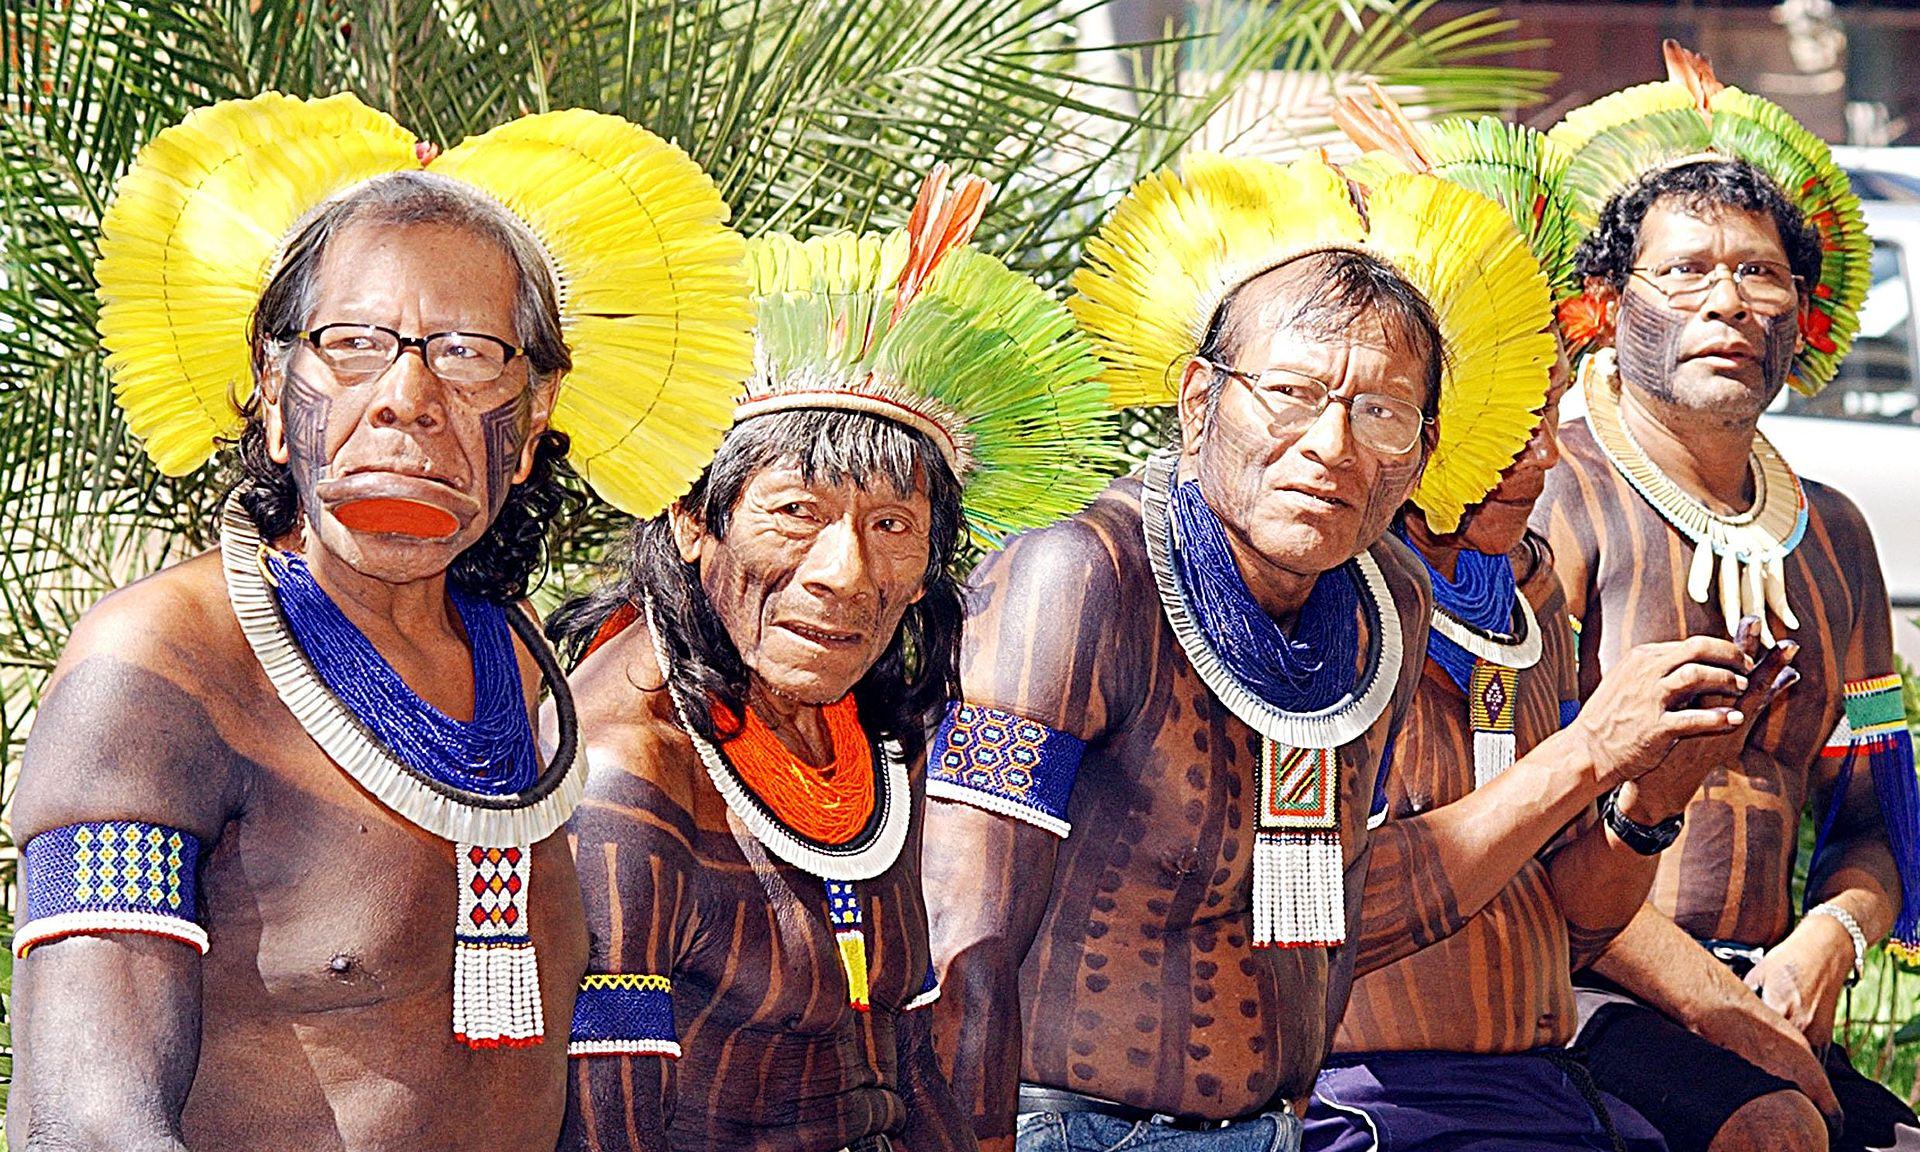 Kayapo Tribe Face Paint